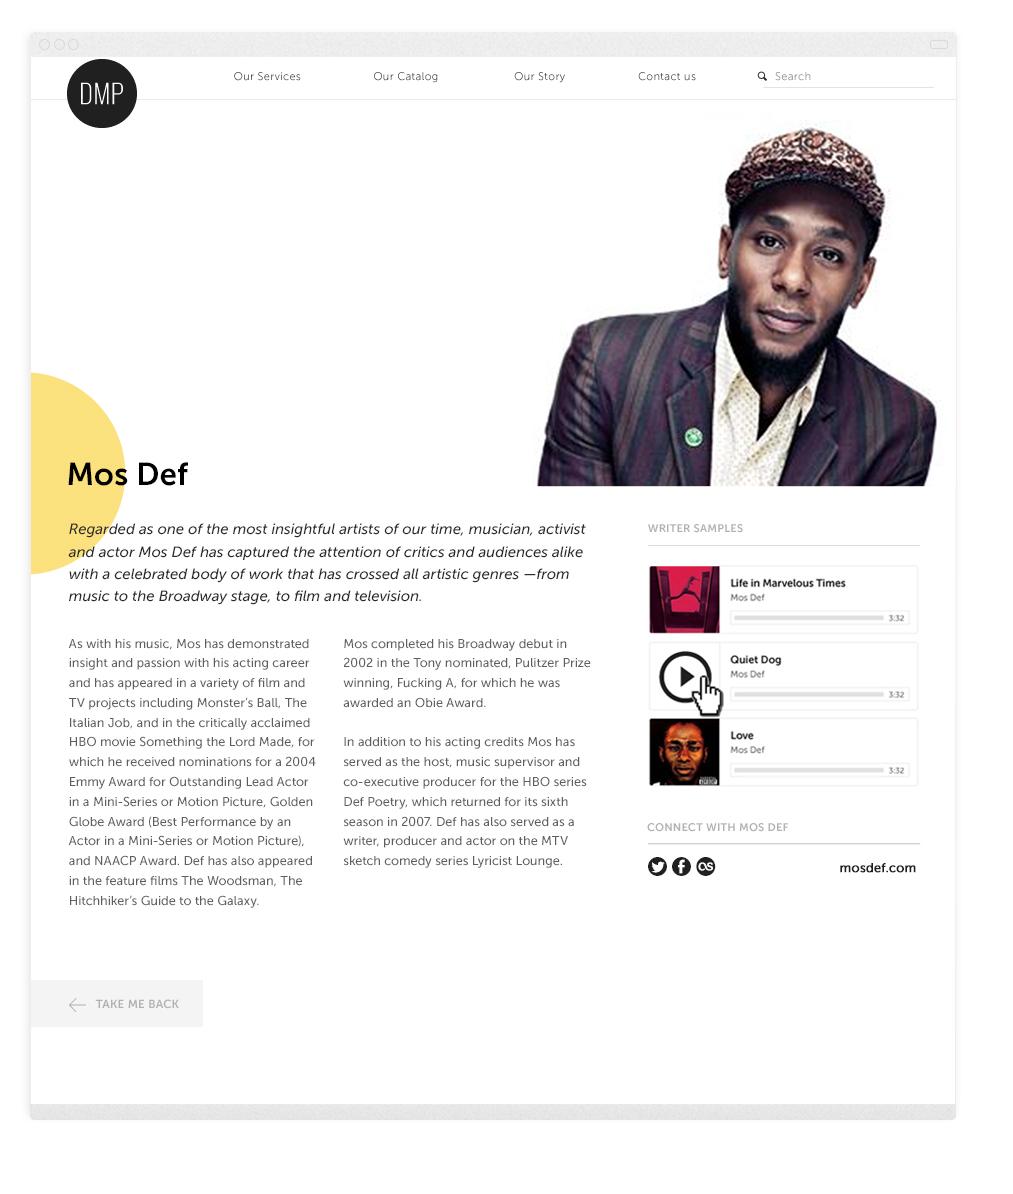 zmaic-downtown-music-publishing-dmp_responsive-web-design-strategy-music-catalog-artist-mos-def.jpg